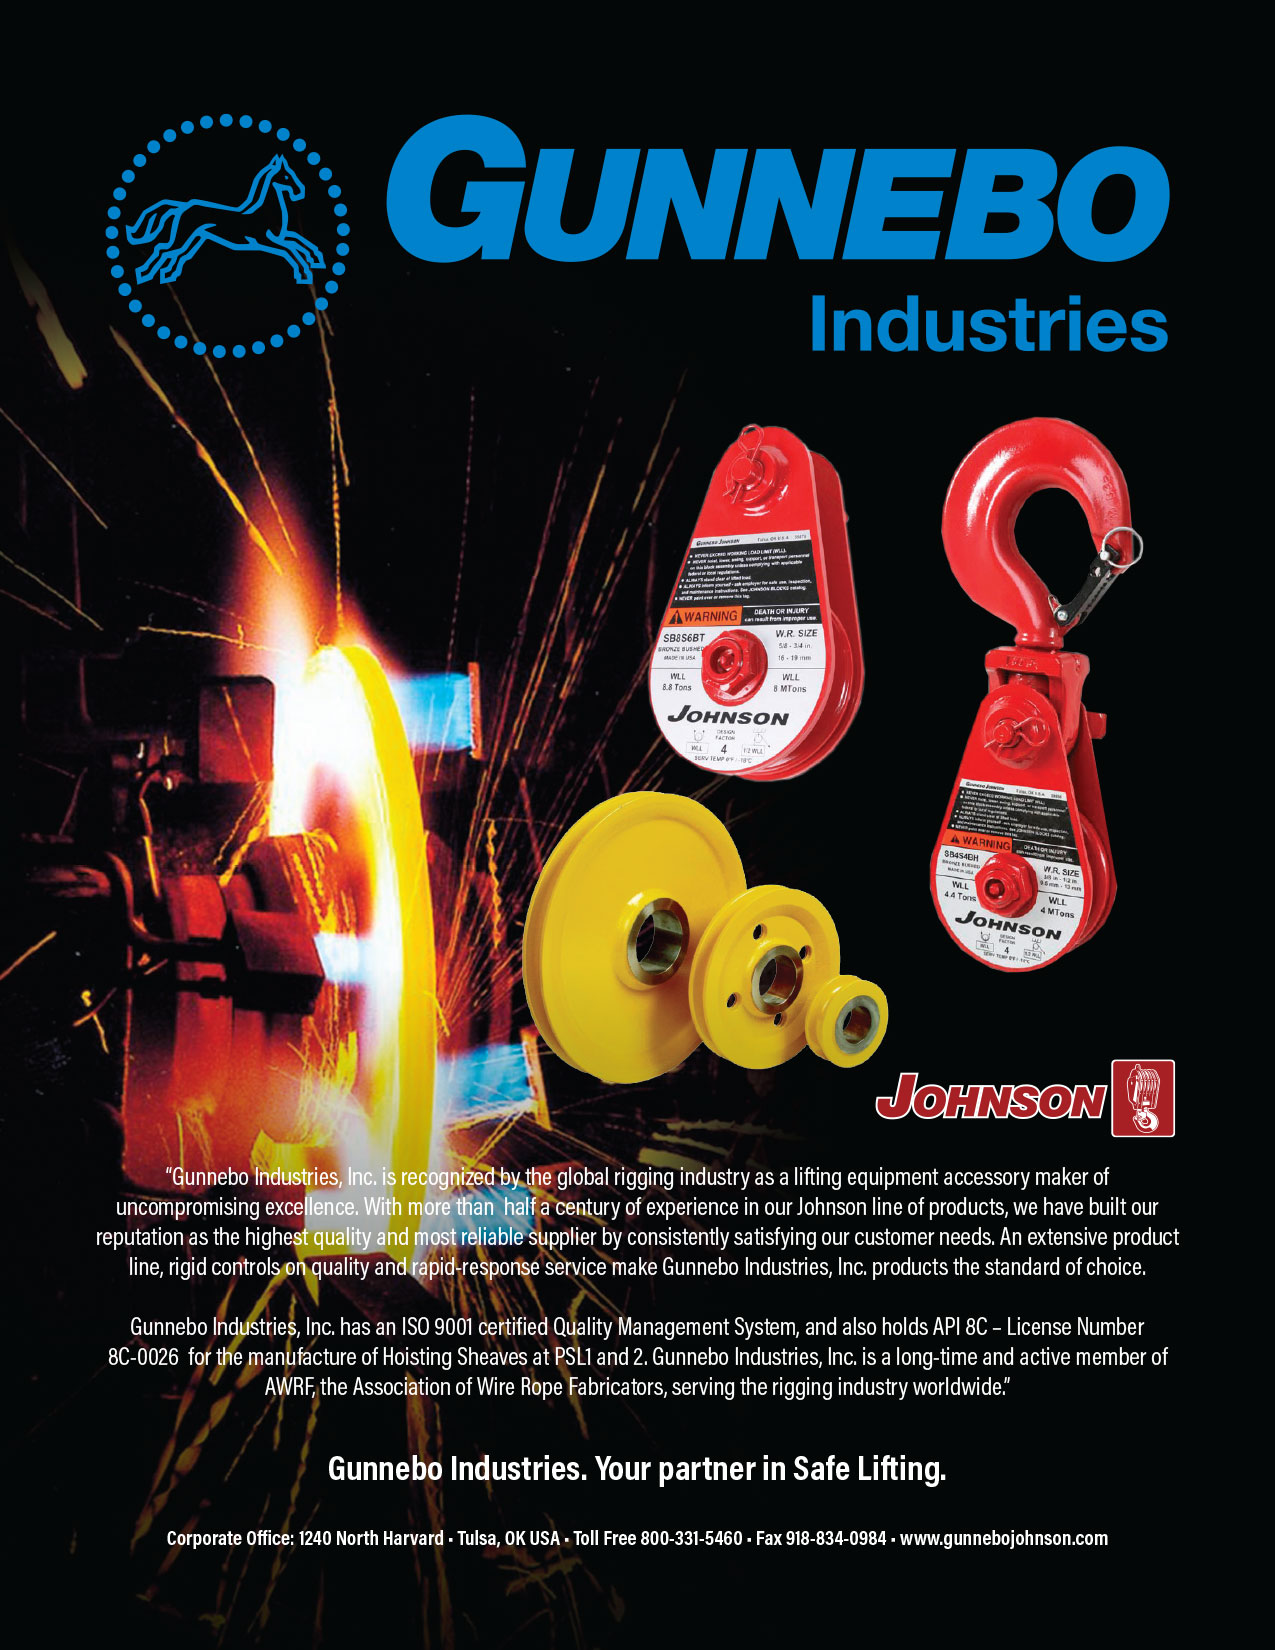 Gunnebo Industries